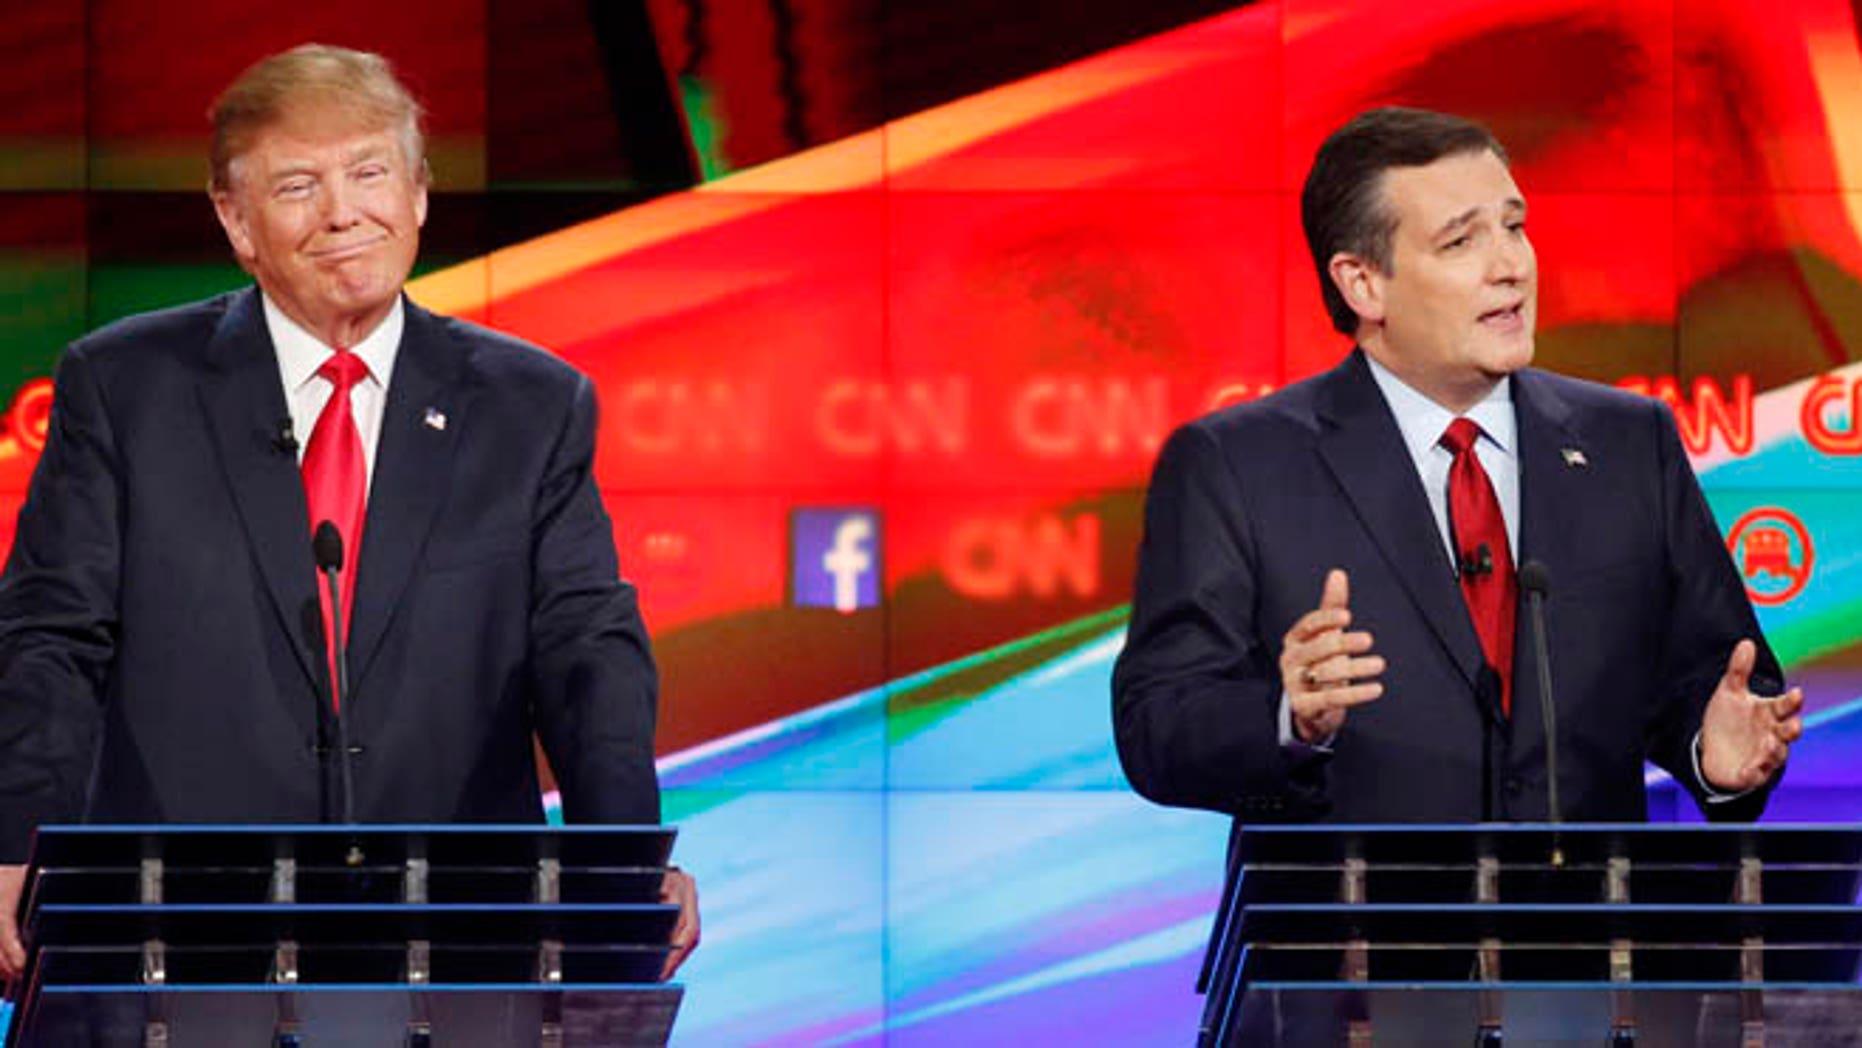 Ted Cruz, right, makes a point as Donald Trump reacts during the CNN Republican presidential debate at the Venetian Hotel & Casino on Tuesday, Dec. 15, 2015, in Las Vegas. (AP Photo/John Locher)